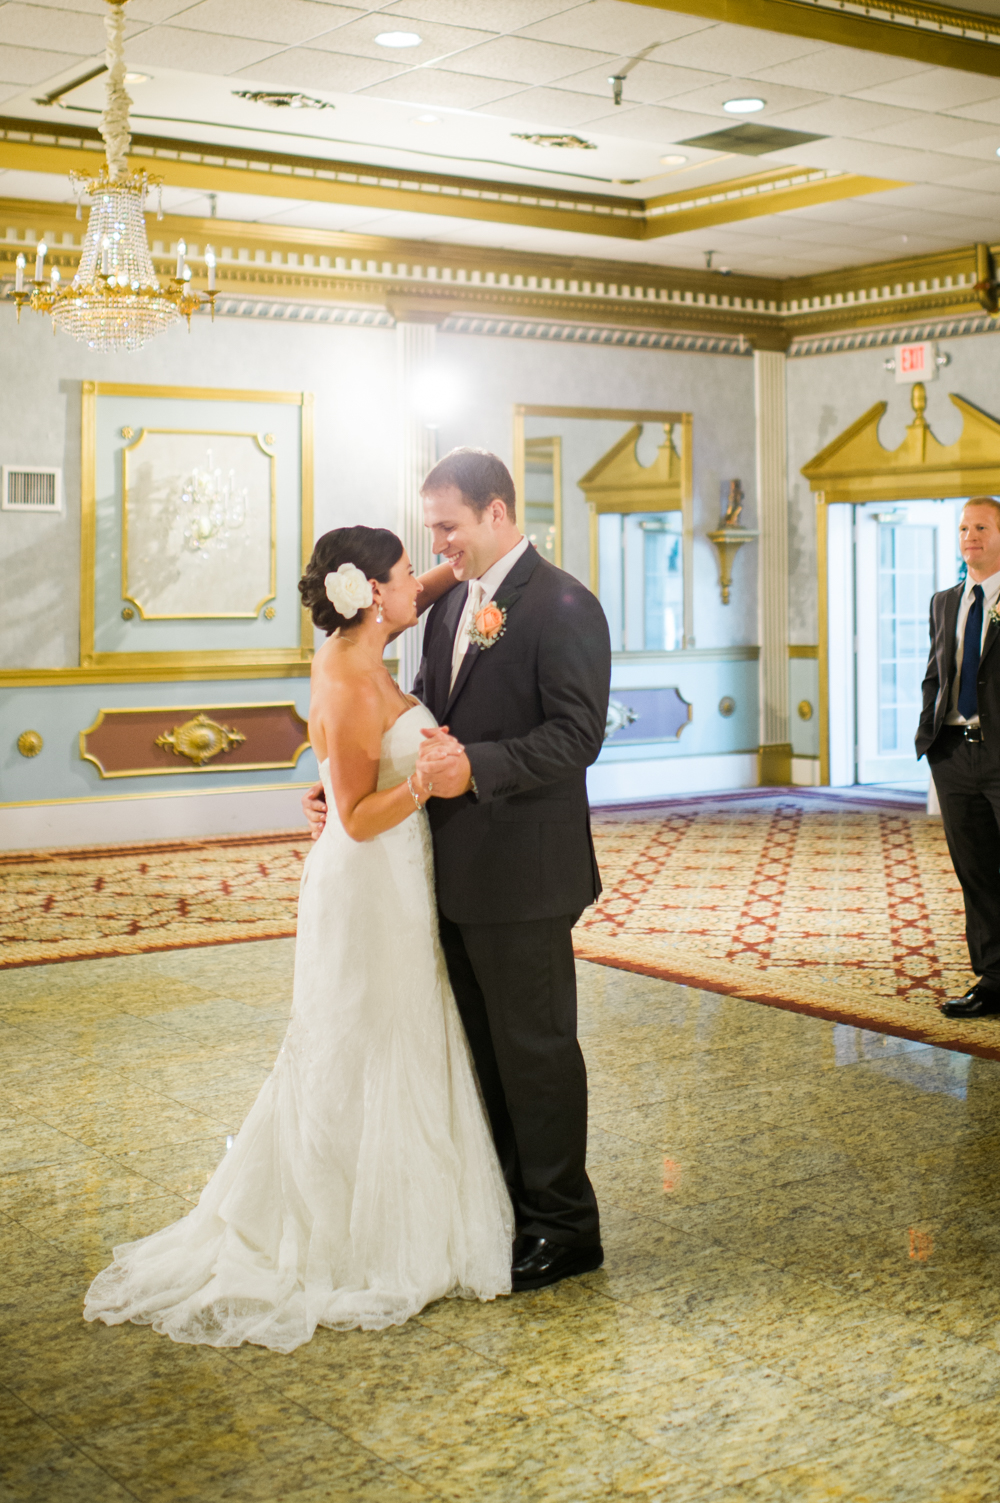 Mendenhall_Inn_Wedding_Pennsylvania_Rebecca_Watkins_Photography_2014-057.jpg